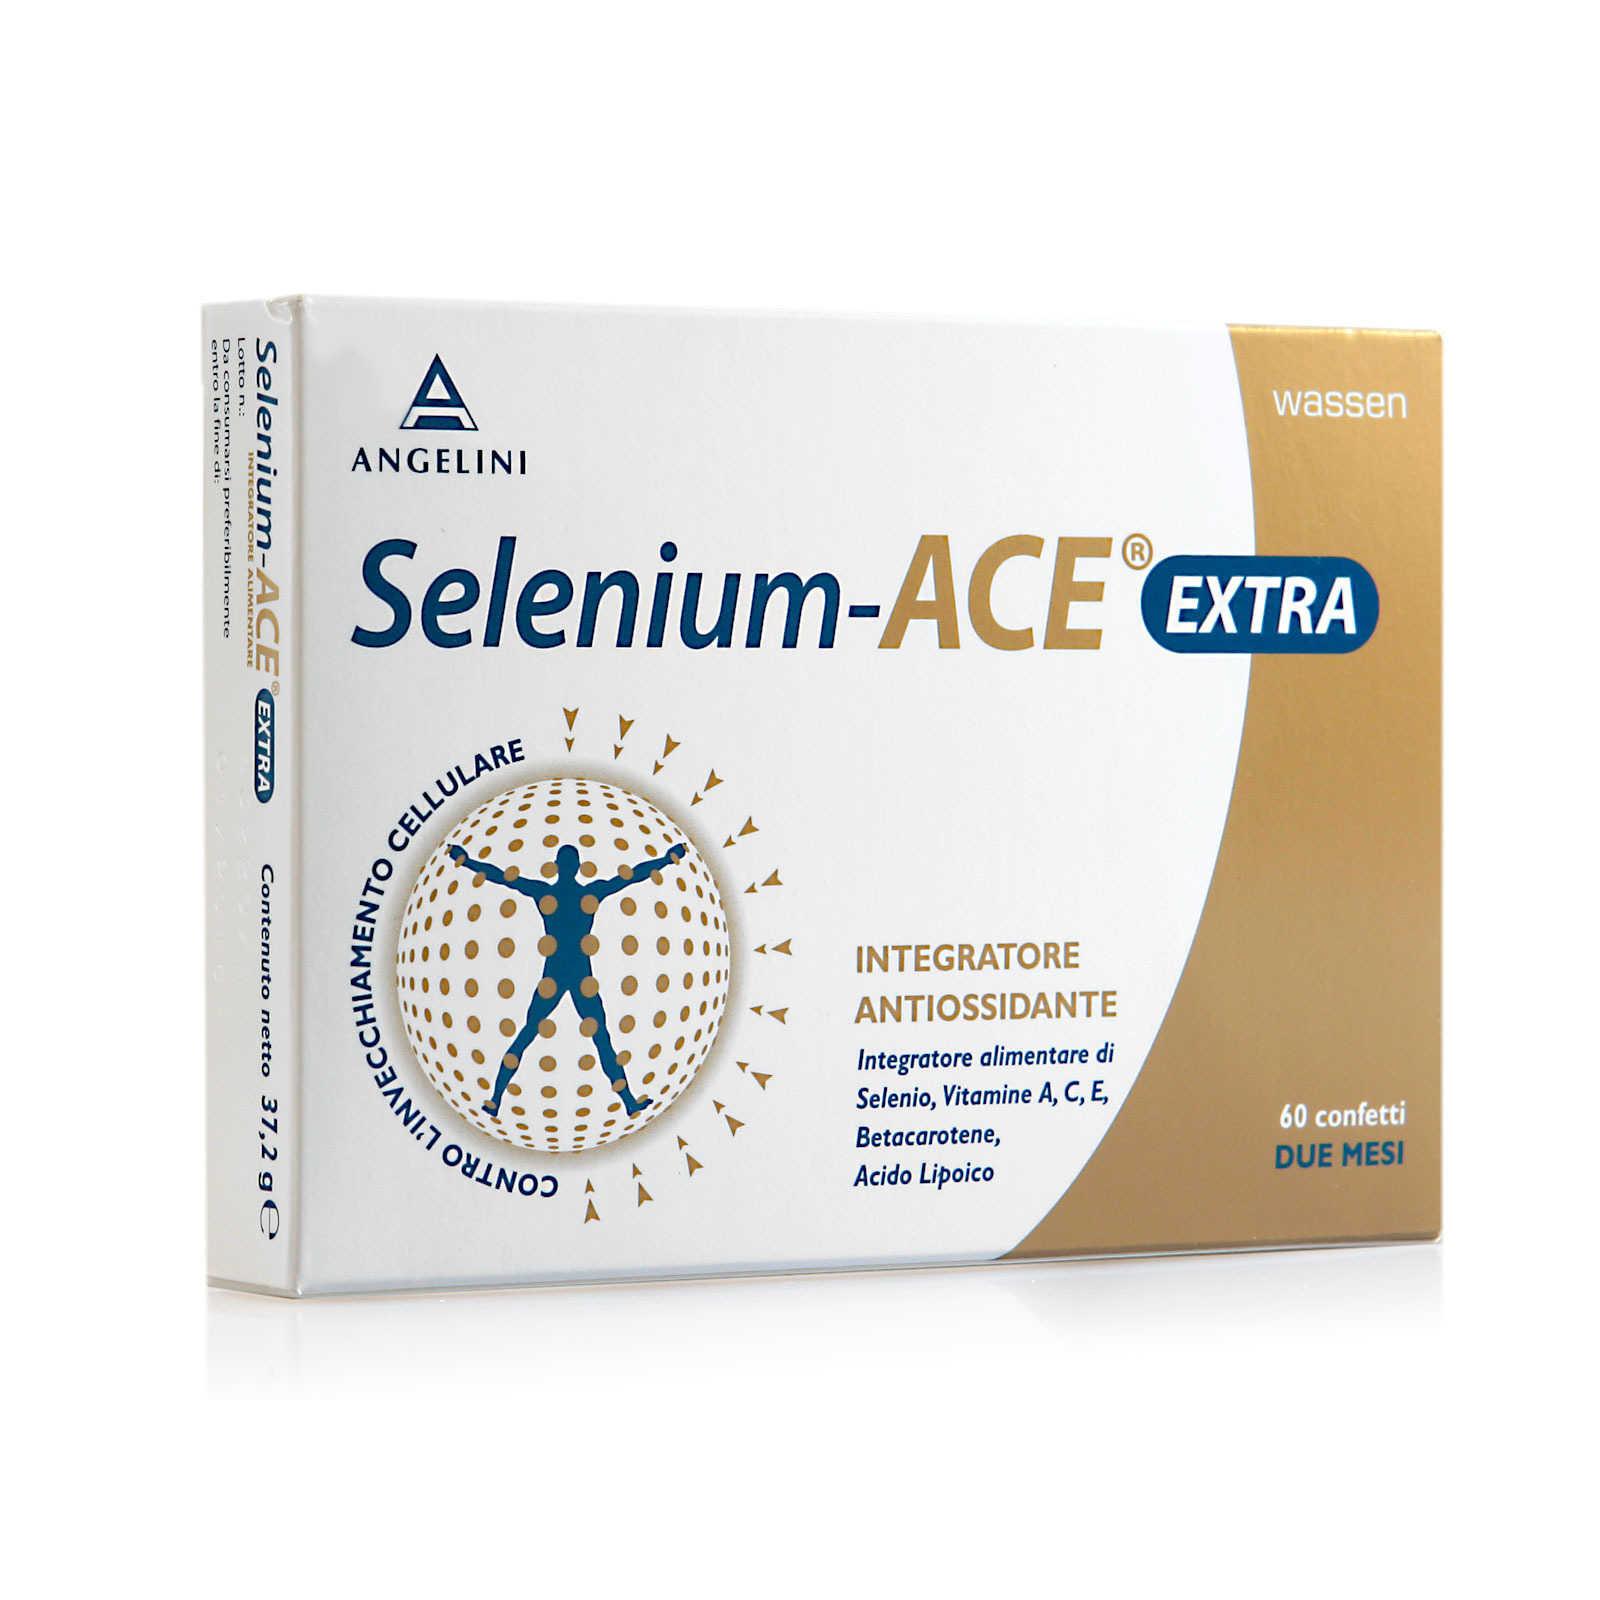 Selenium Ace - Extra